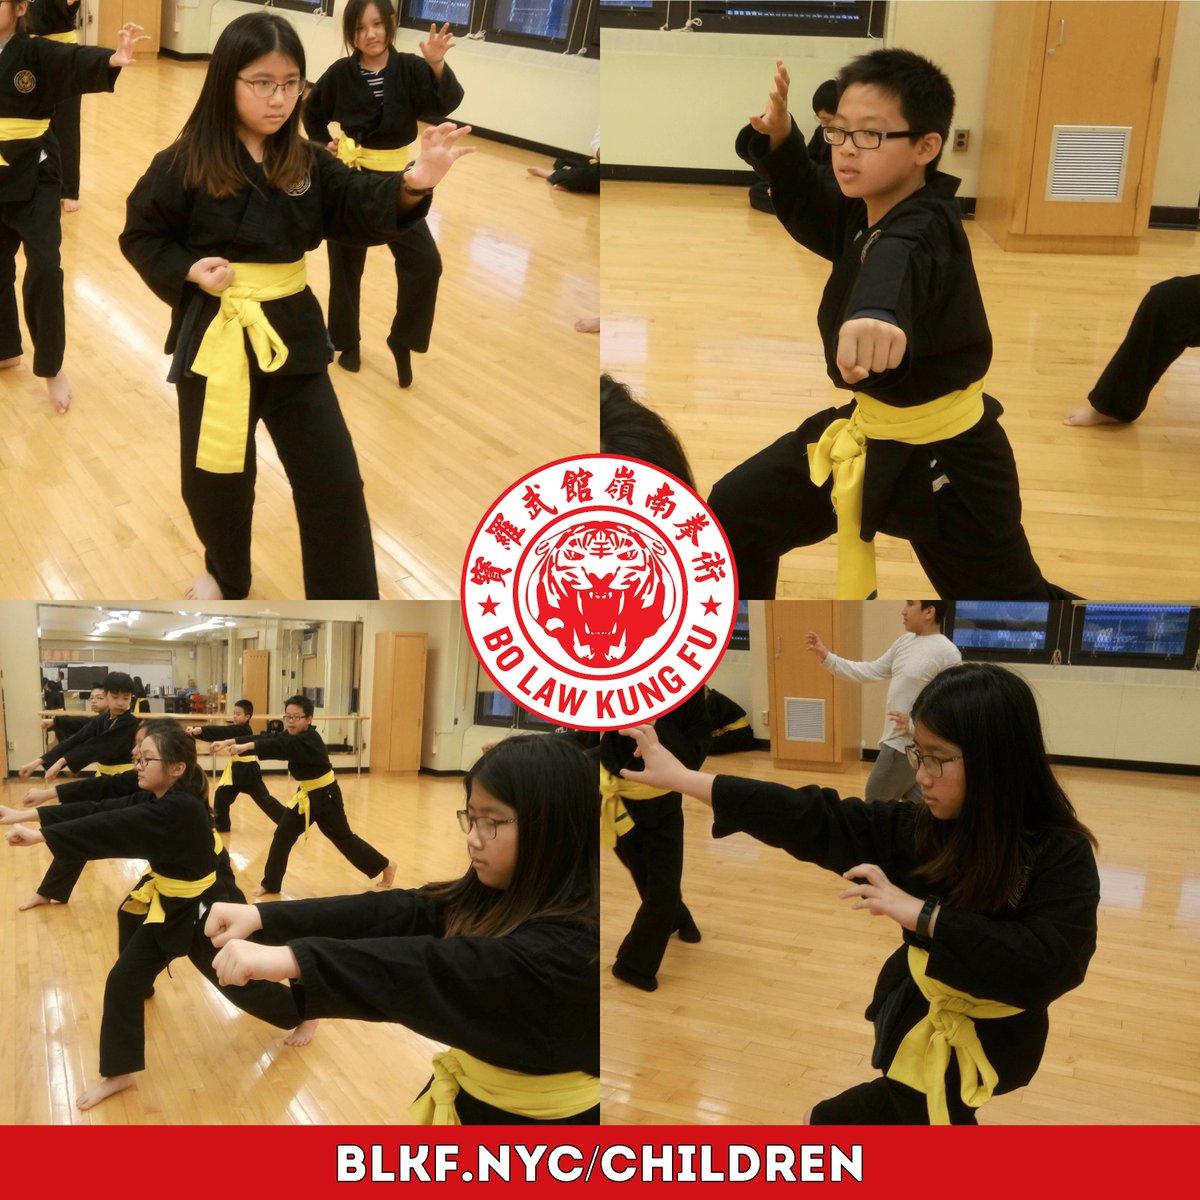 Bo Law Kung Fu On Twitter Https T Co 1ow0fdssdj Spring